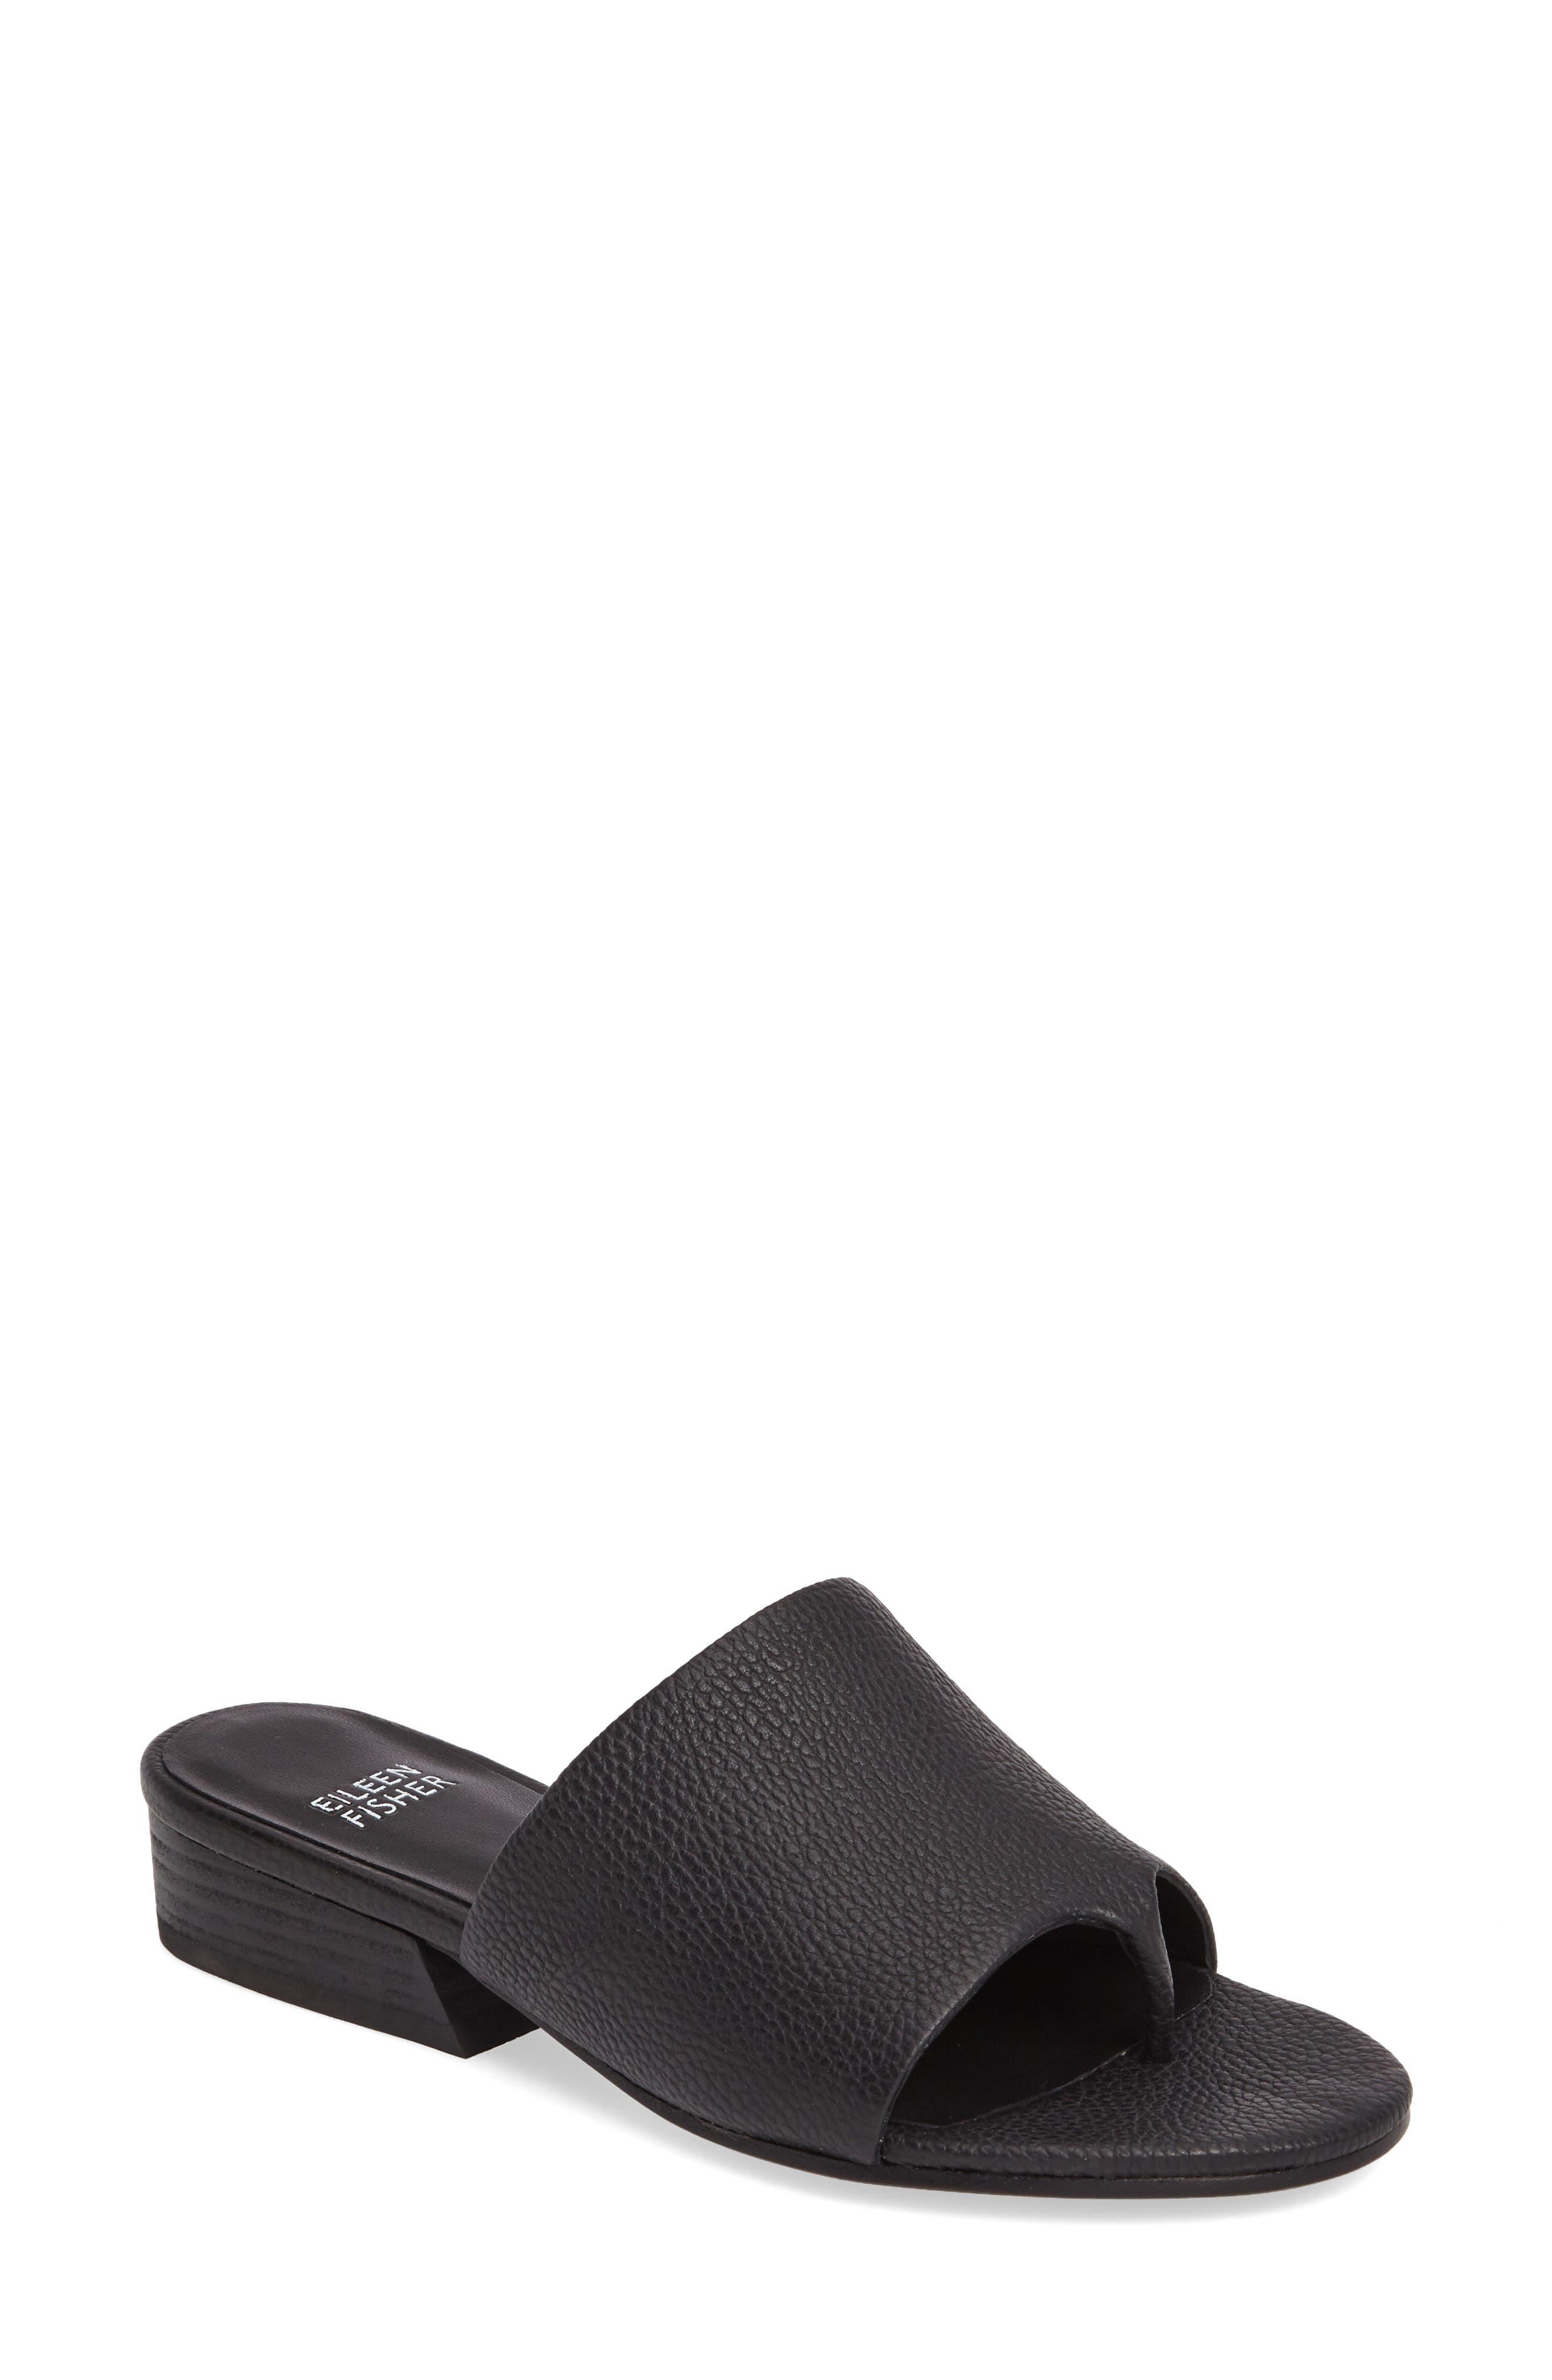 Beal Slide Sandal,                             Main thumbnail 3, color,